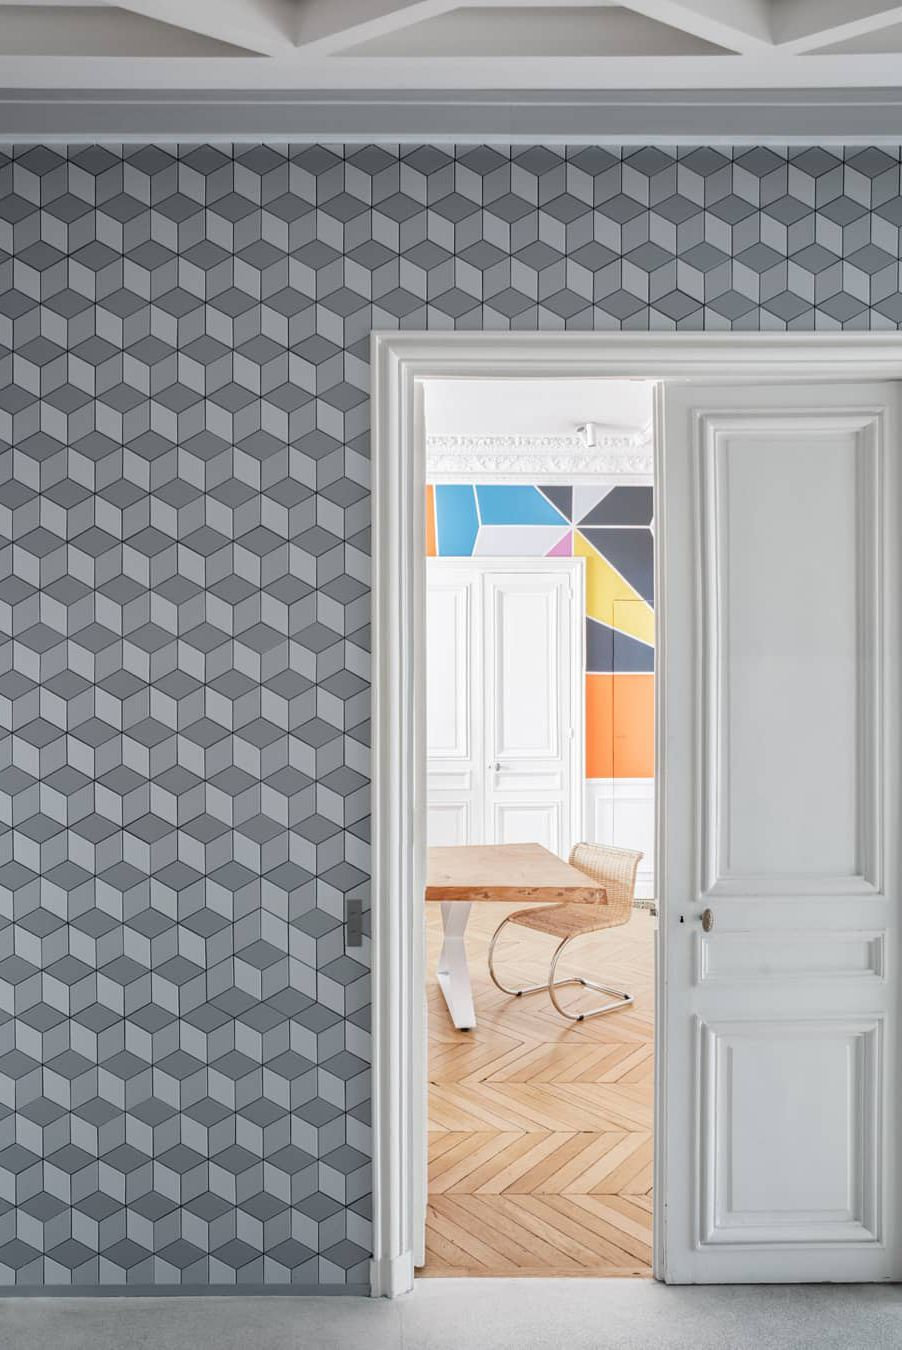 Modern Wallpaper Design For Home - HD Wallpaper